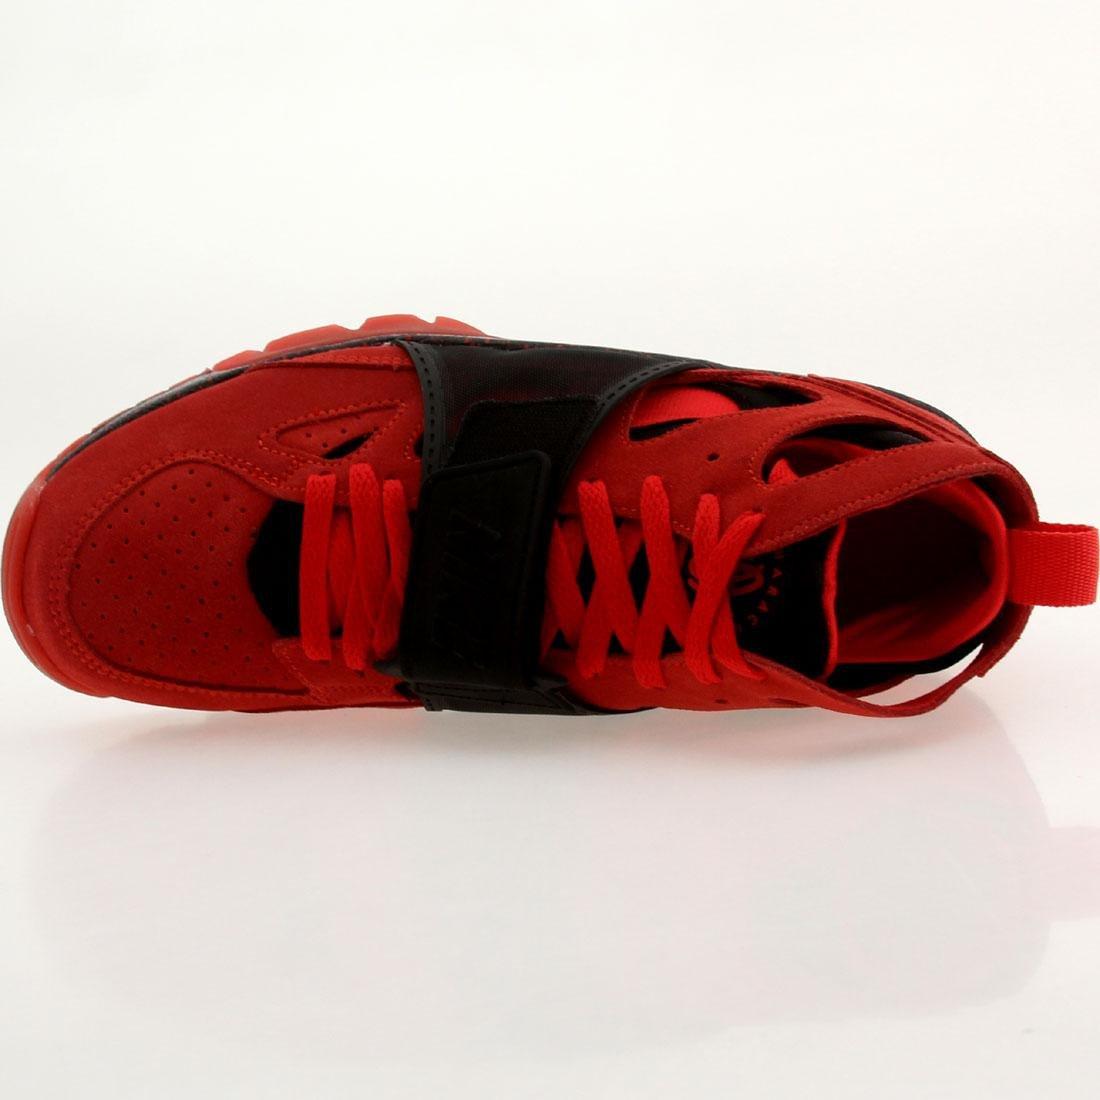 Amazon.com | Nike Air Trainer Huarache Prm Qs Mens Style: 647591-600 Size: 9 | Tennis & Racquet Sports